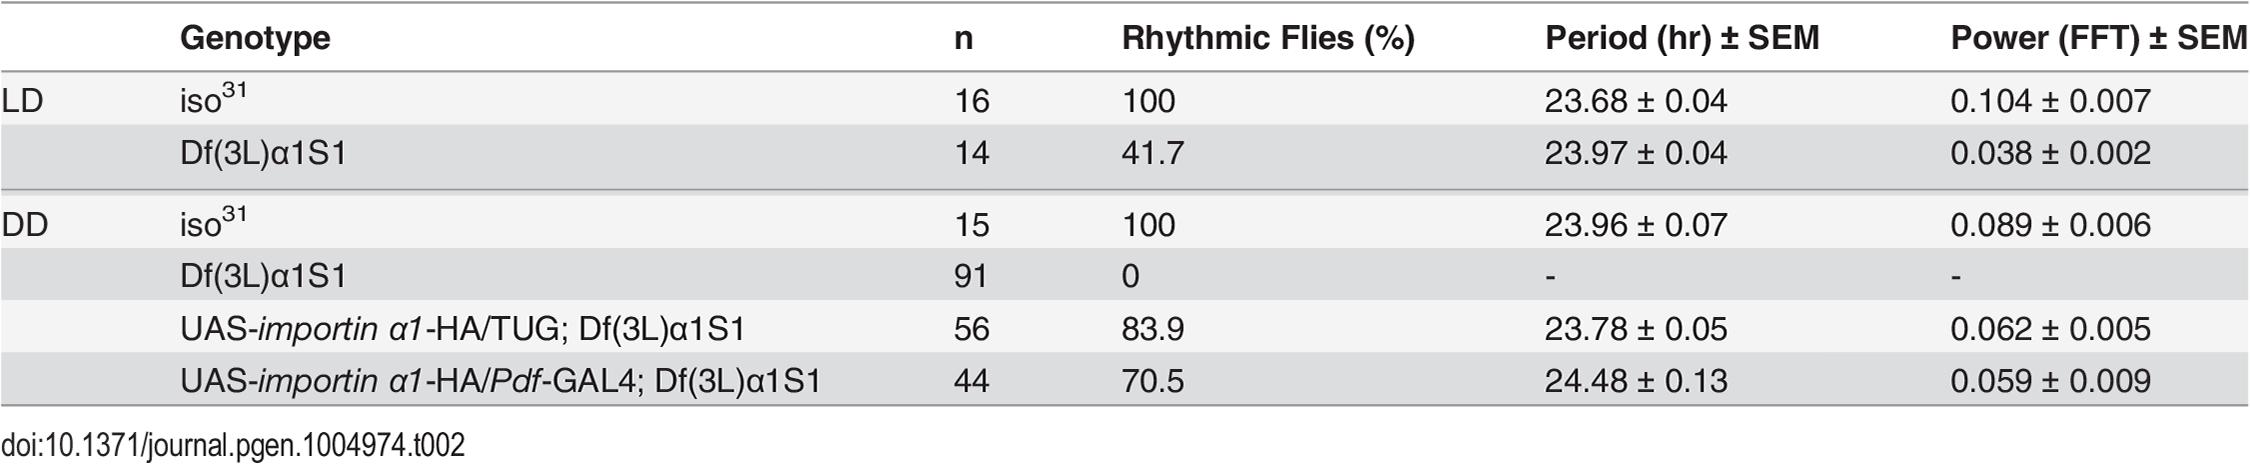 Free-running circadian locomotor rhythms in the importin α deletion mutant, Df(3L)α1S1, and rescue lines.